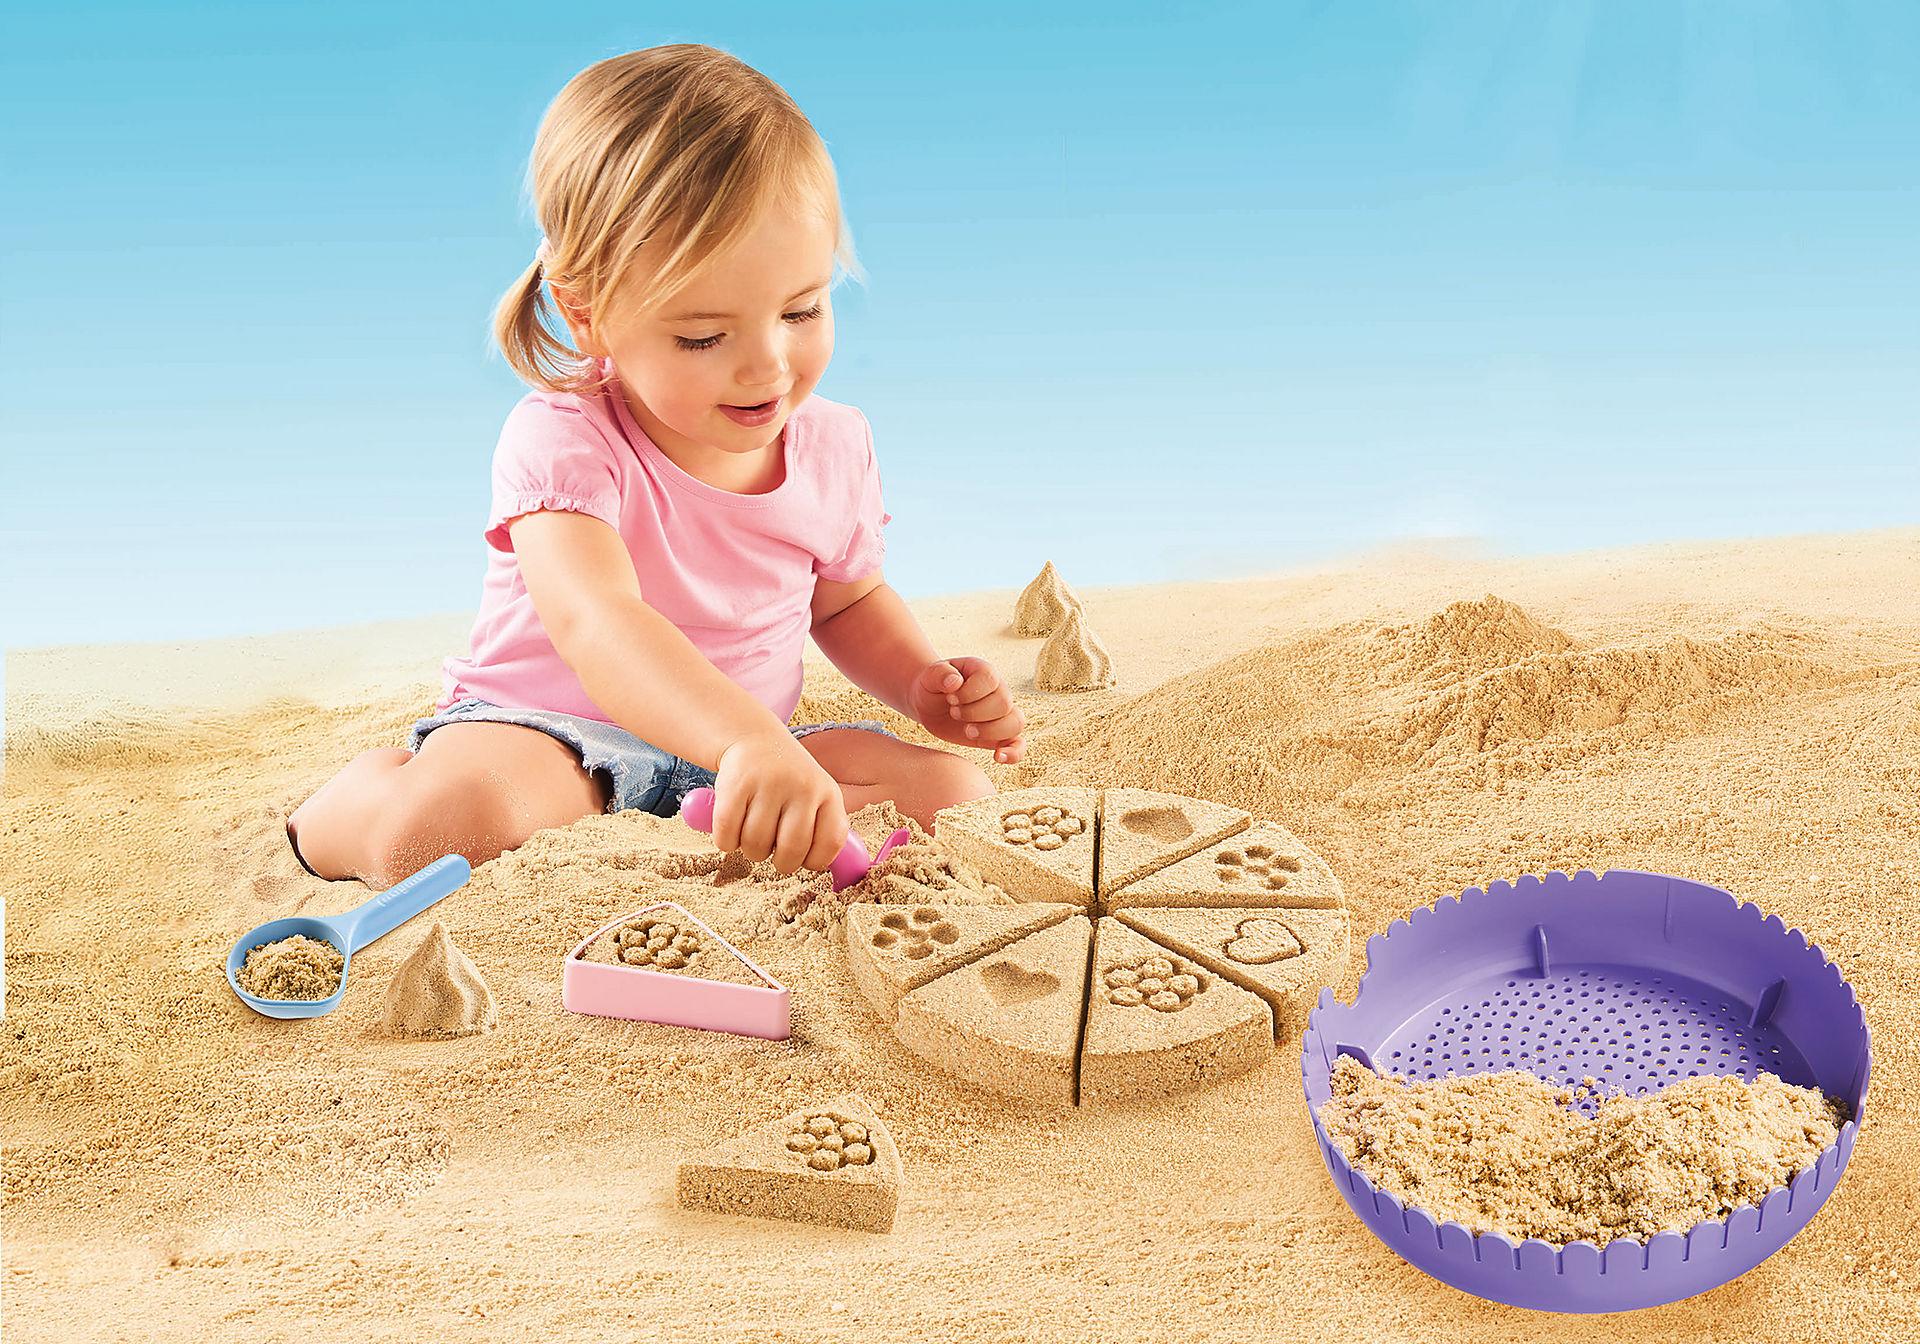 70339 Boulangerie des sables zoom image6